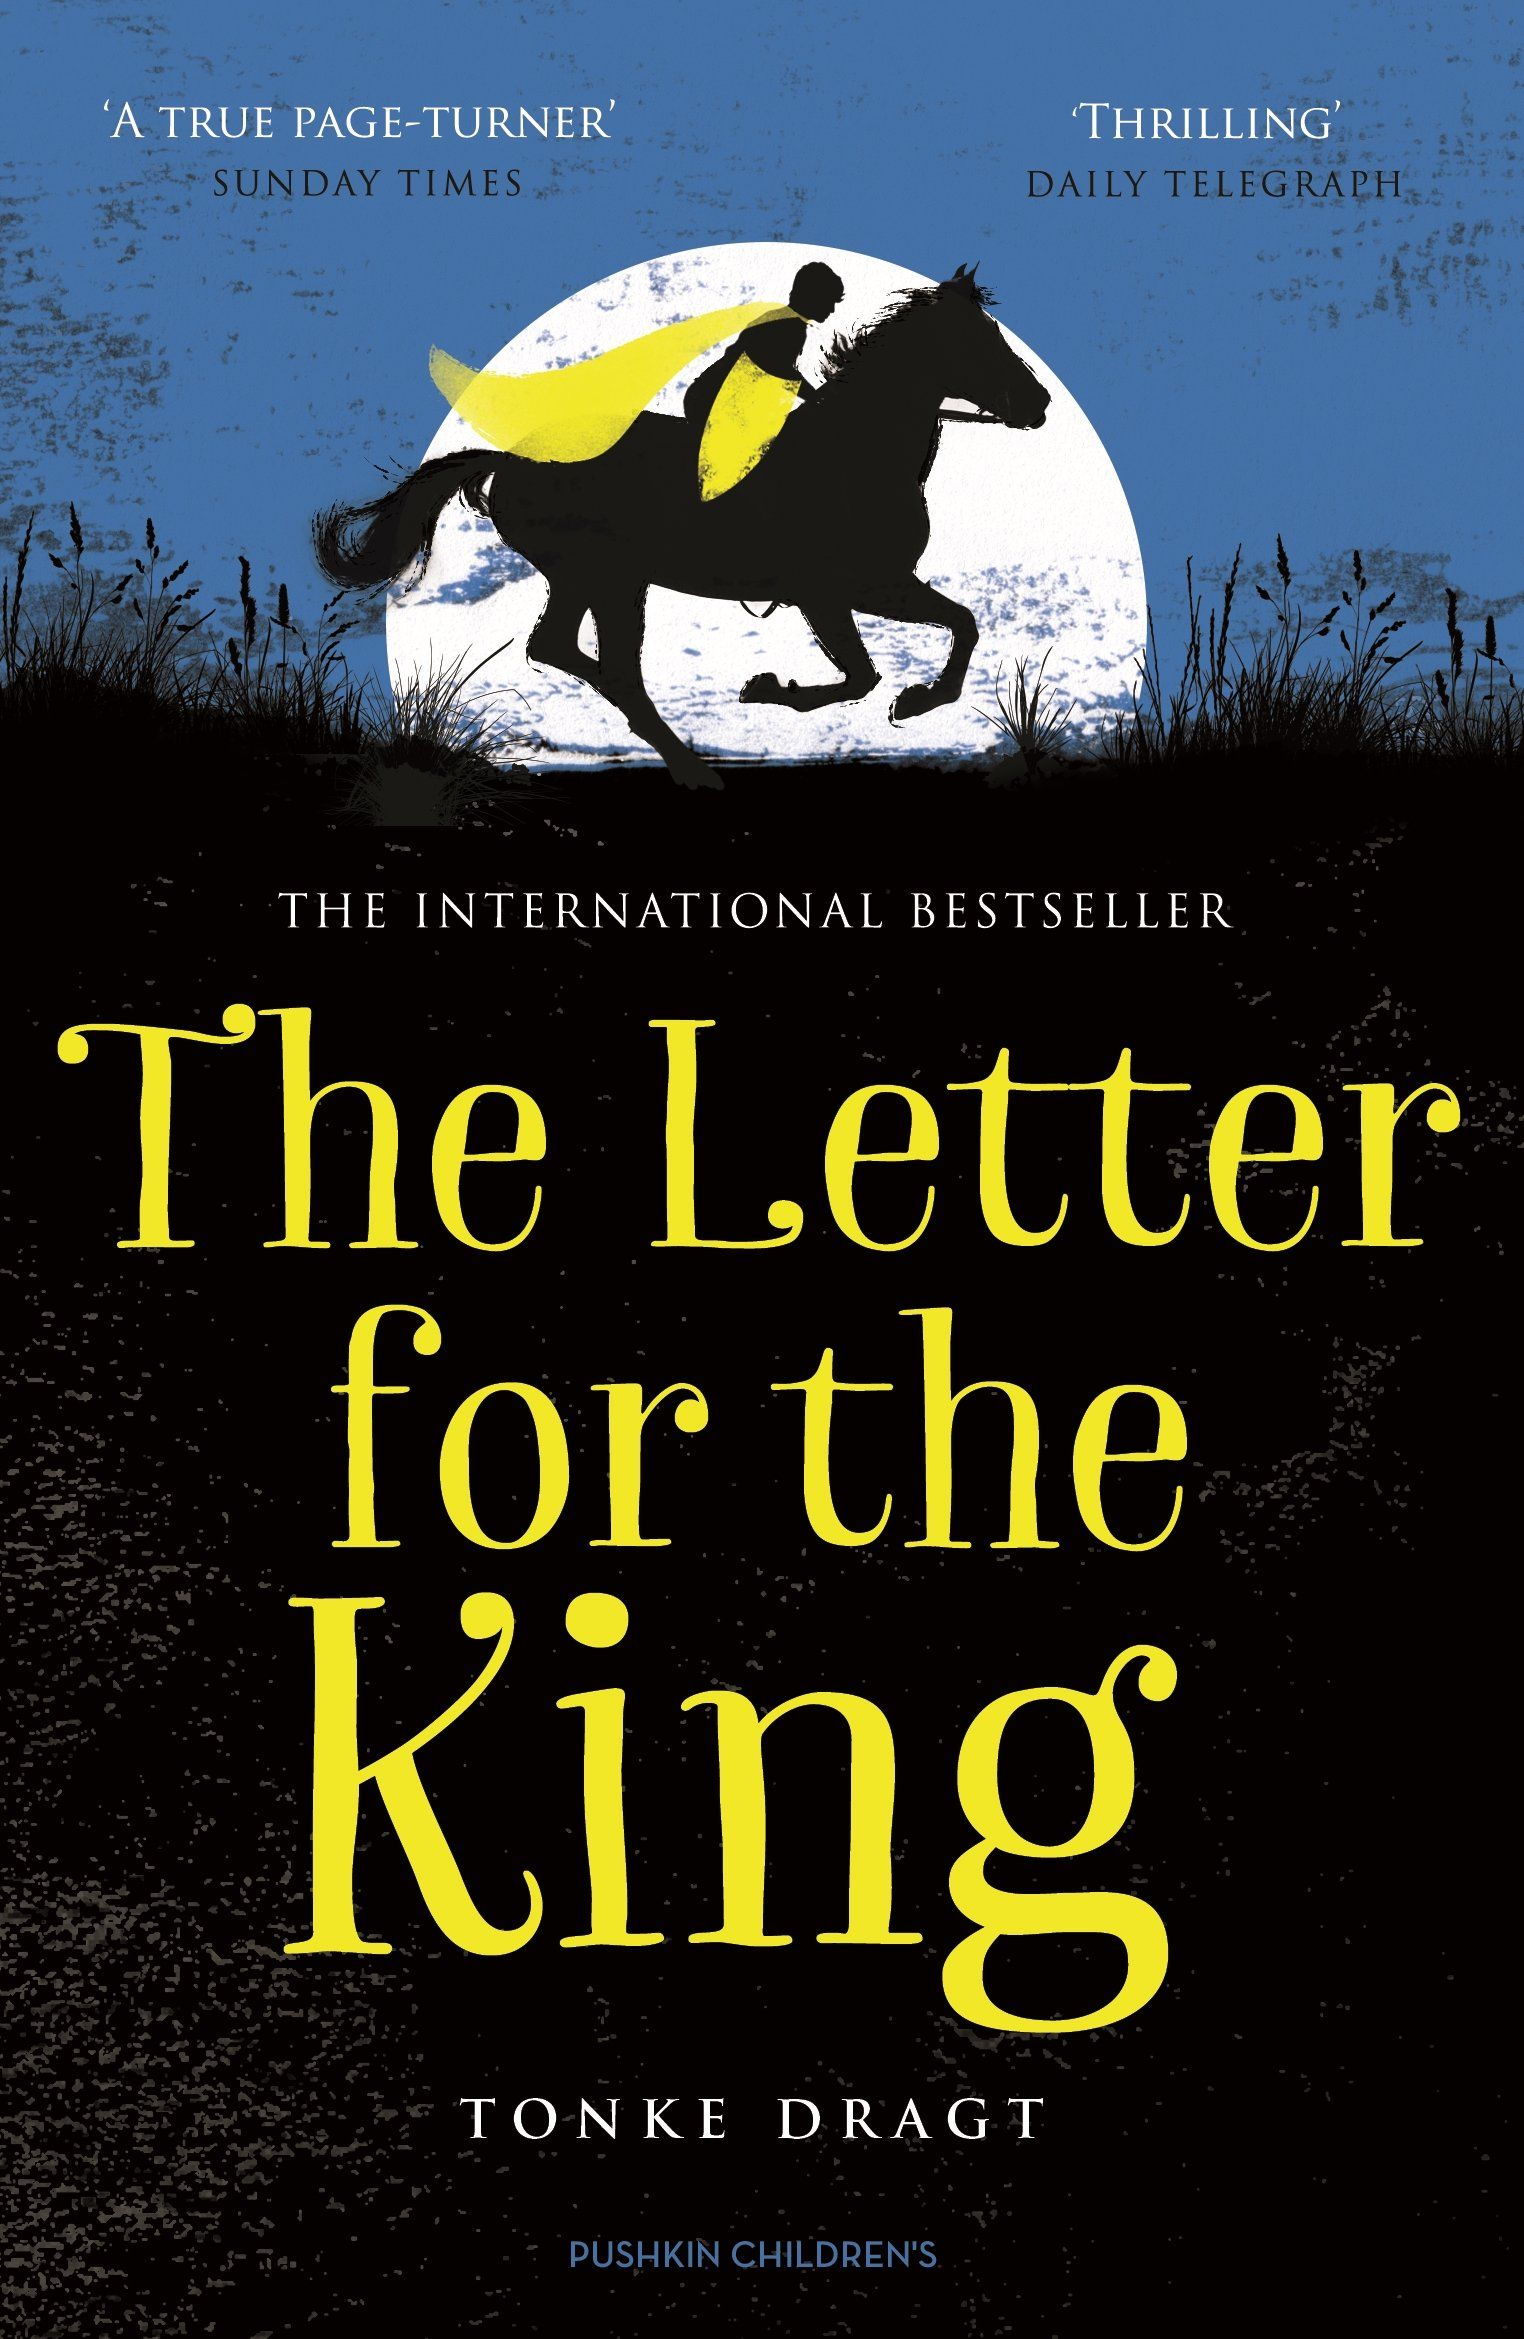 The Letter for the King Author Tonke Dragt Lettering